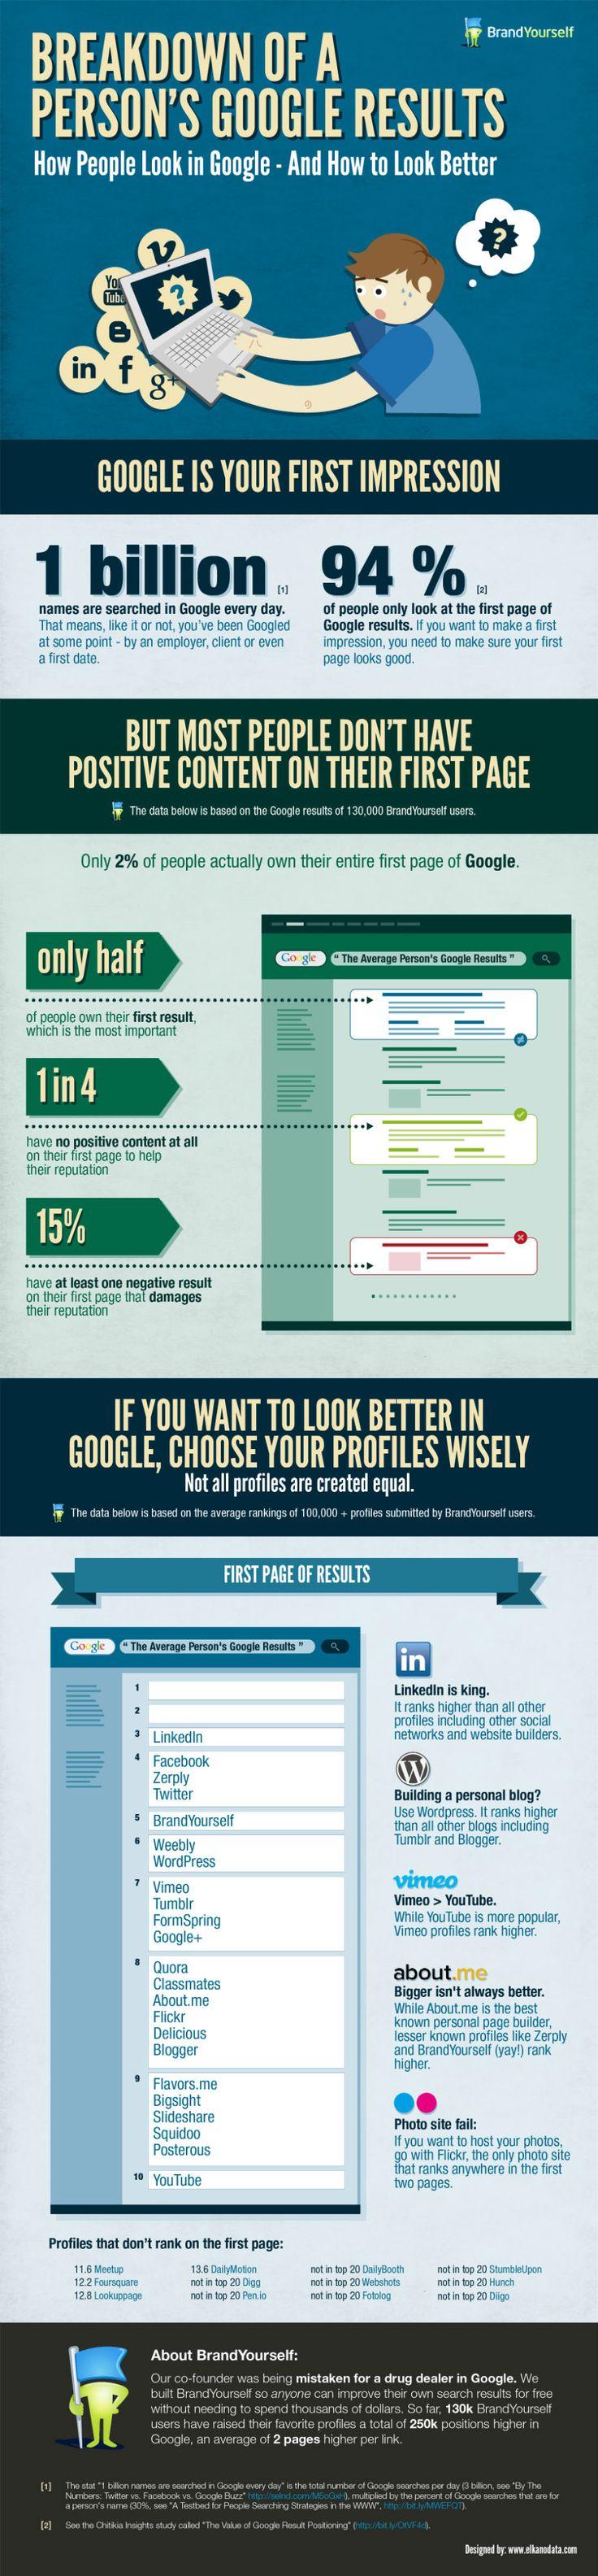 Breakdown Of A Person's Google Results. Bespoke Social Media & Marketing